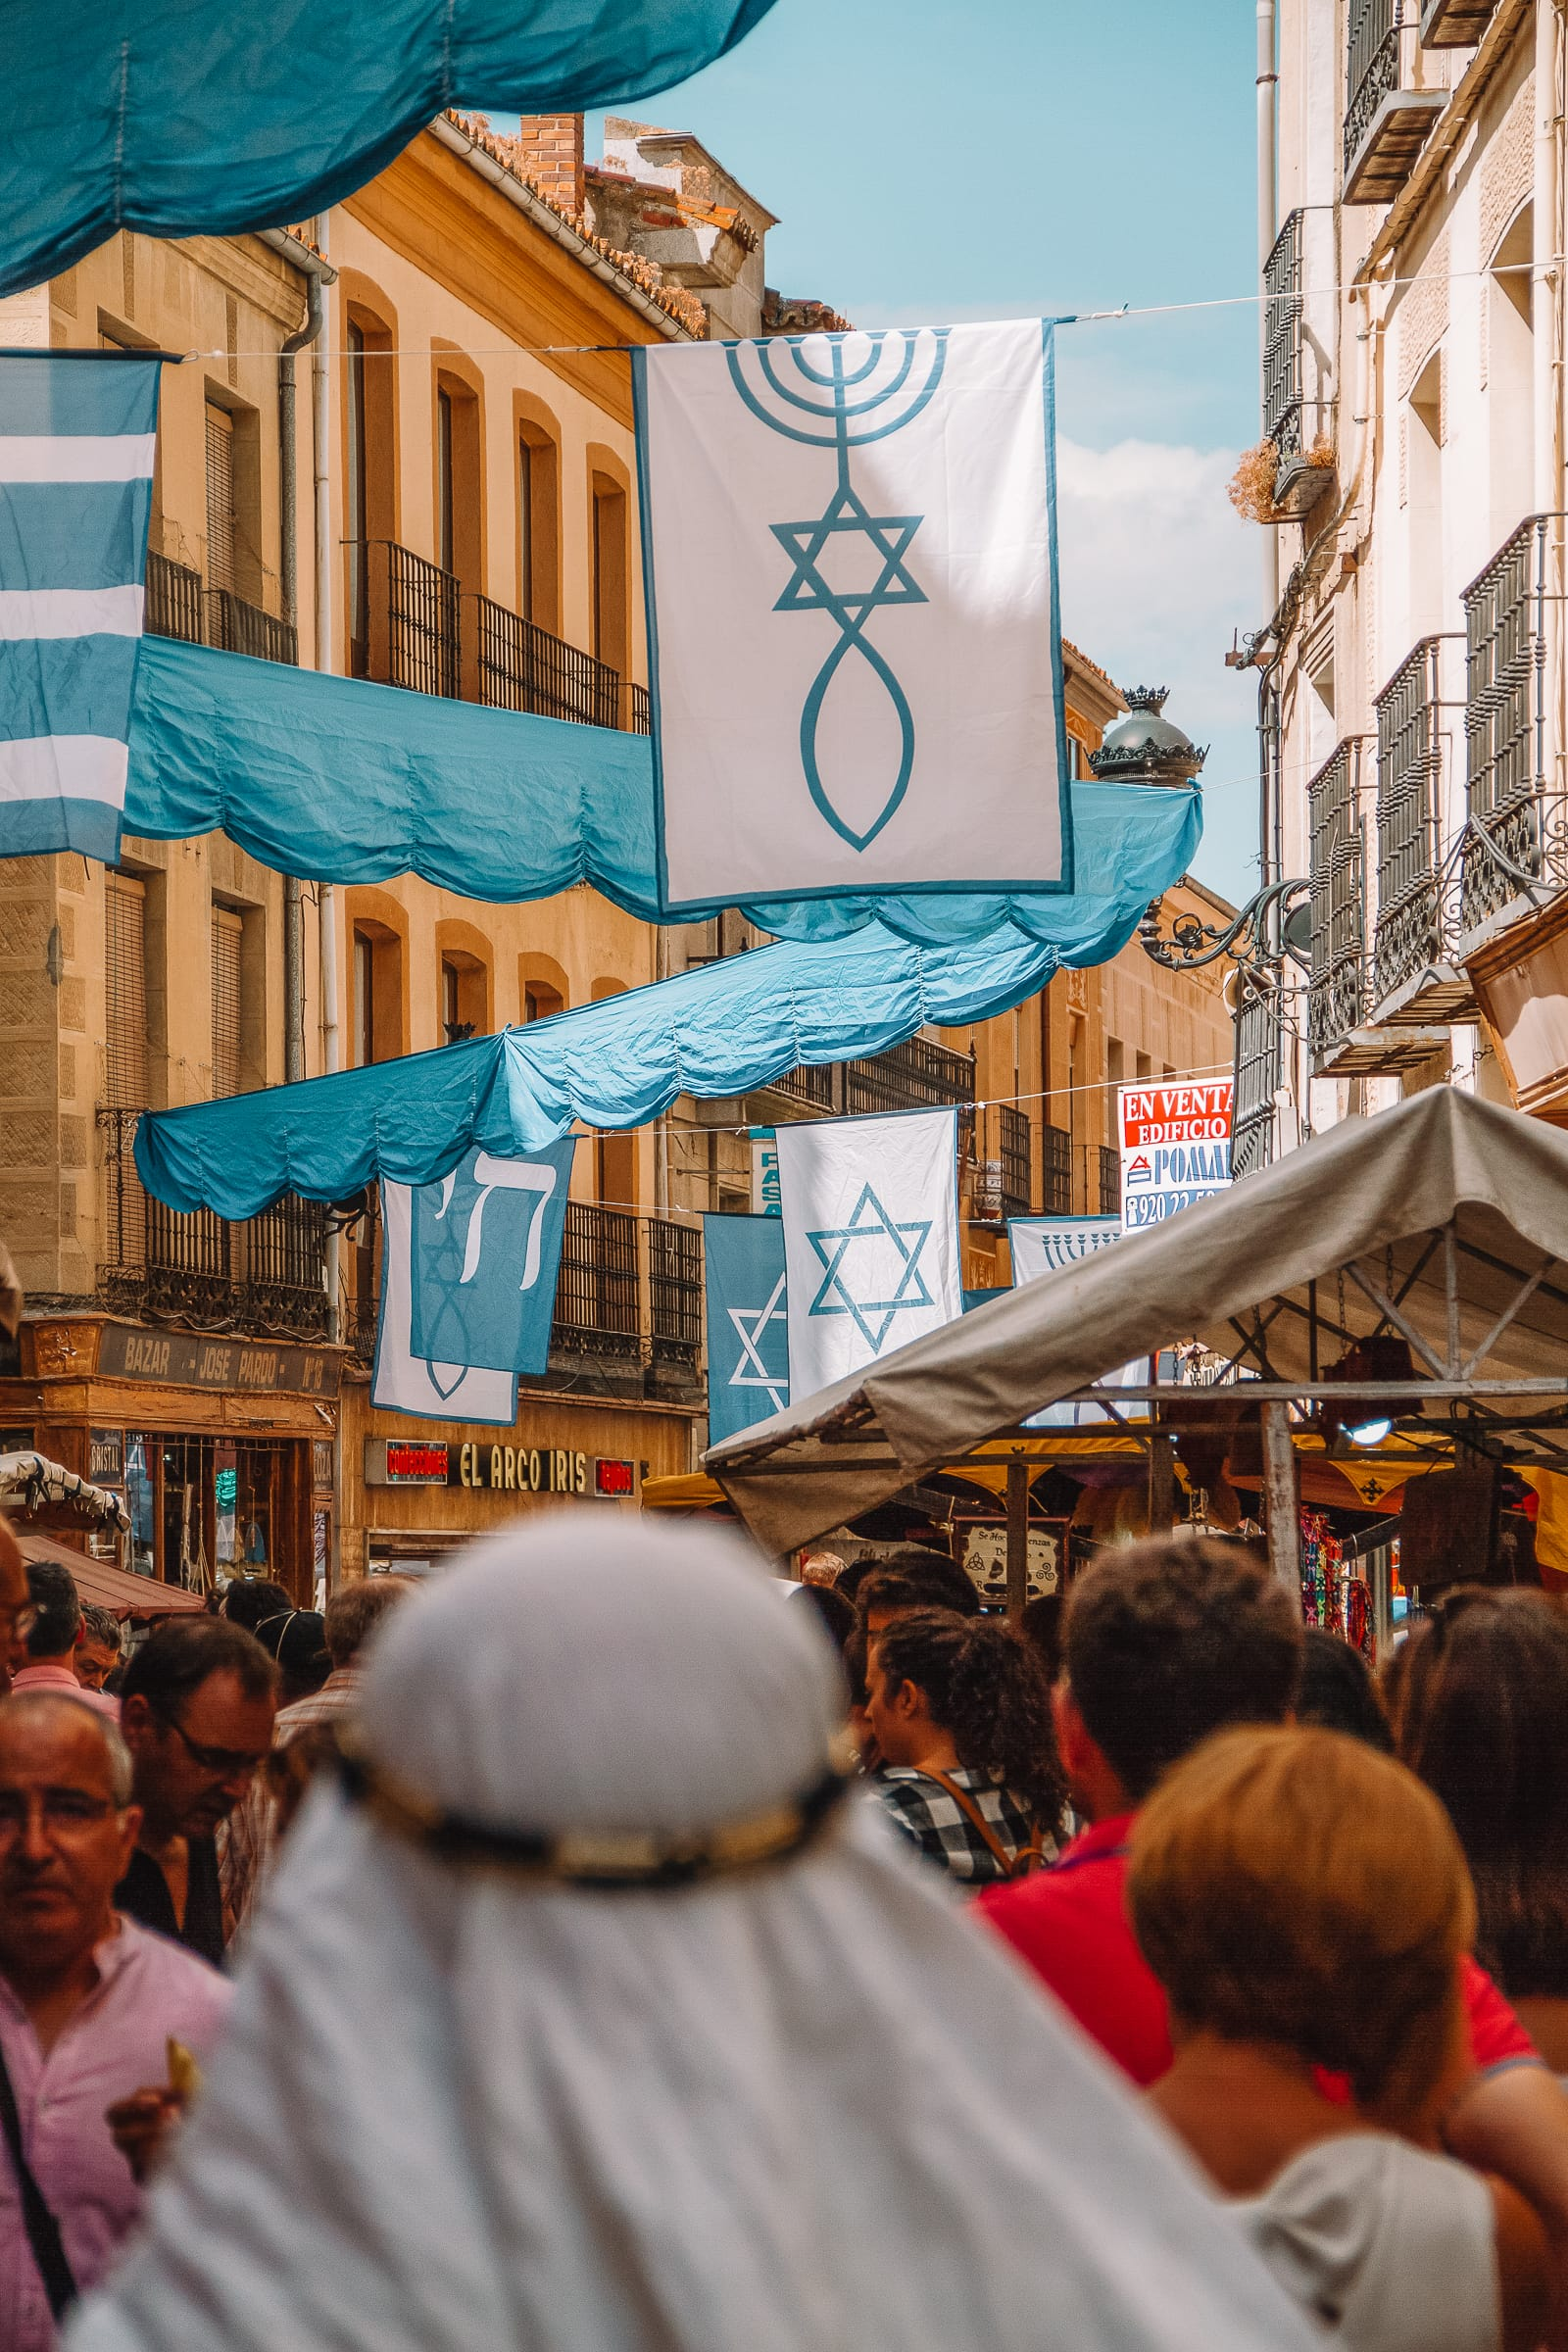 15 Best Things To Do In Avila, Spain (4)